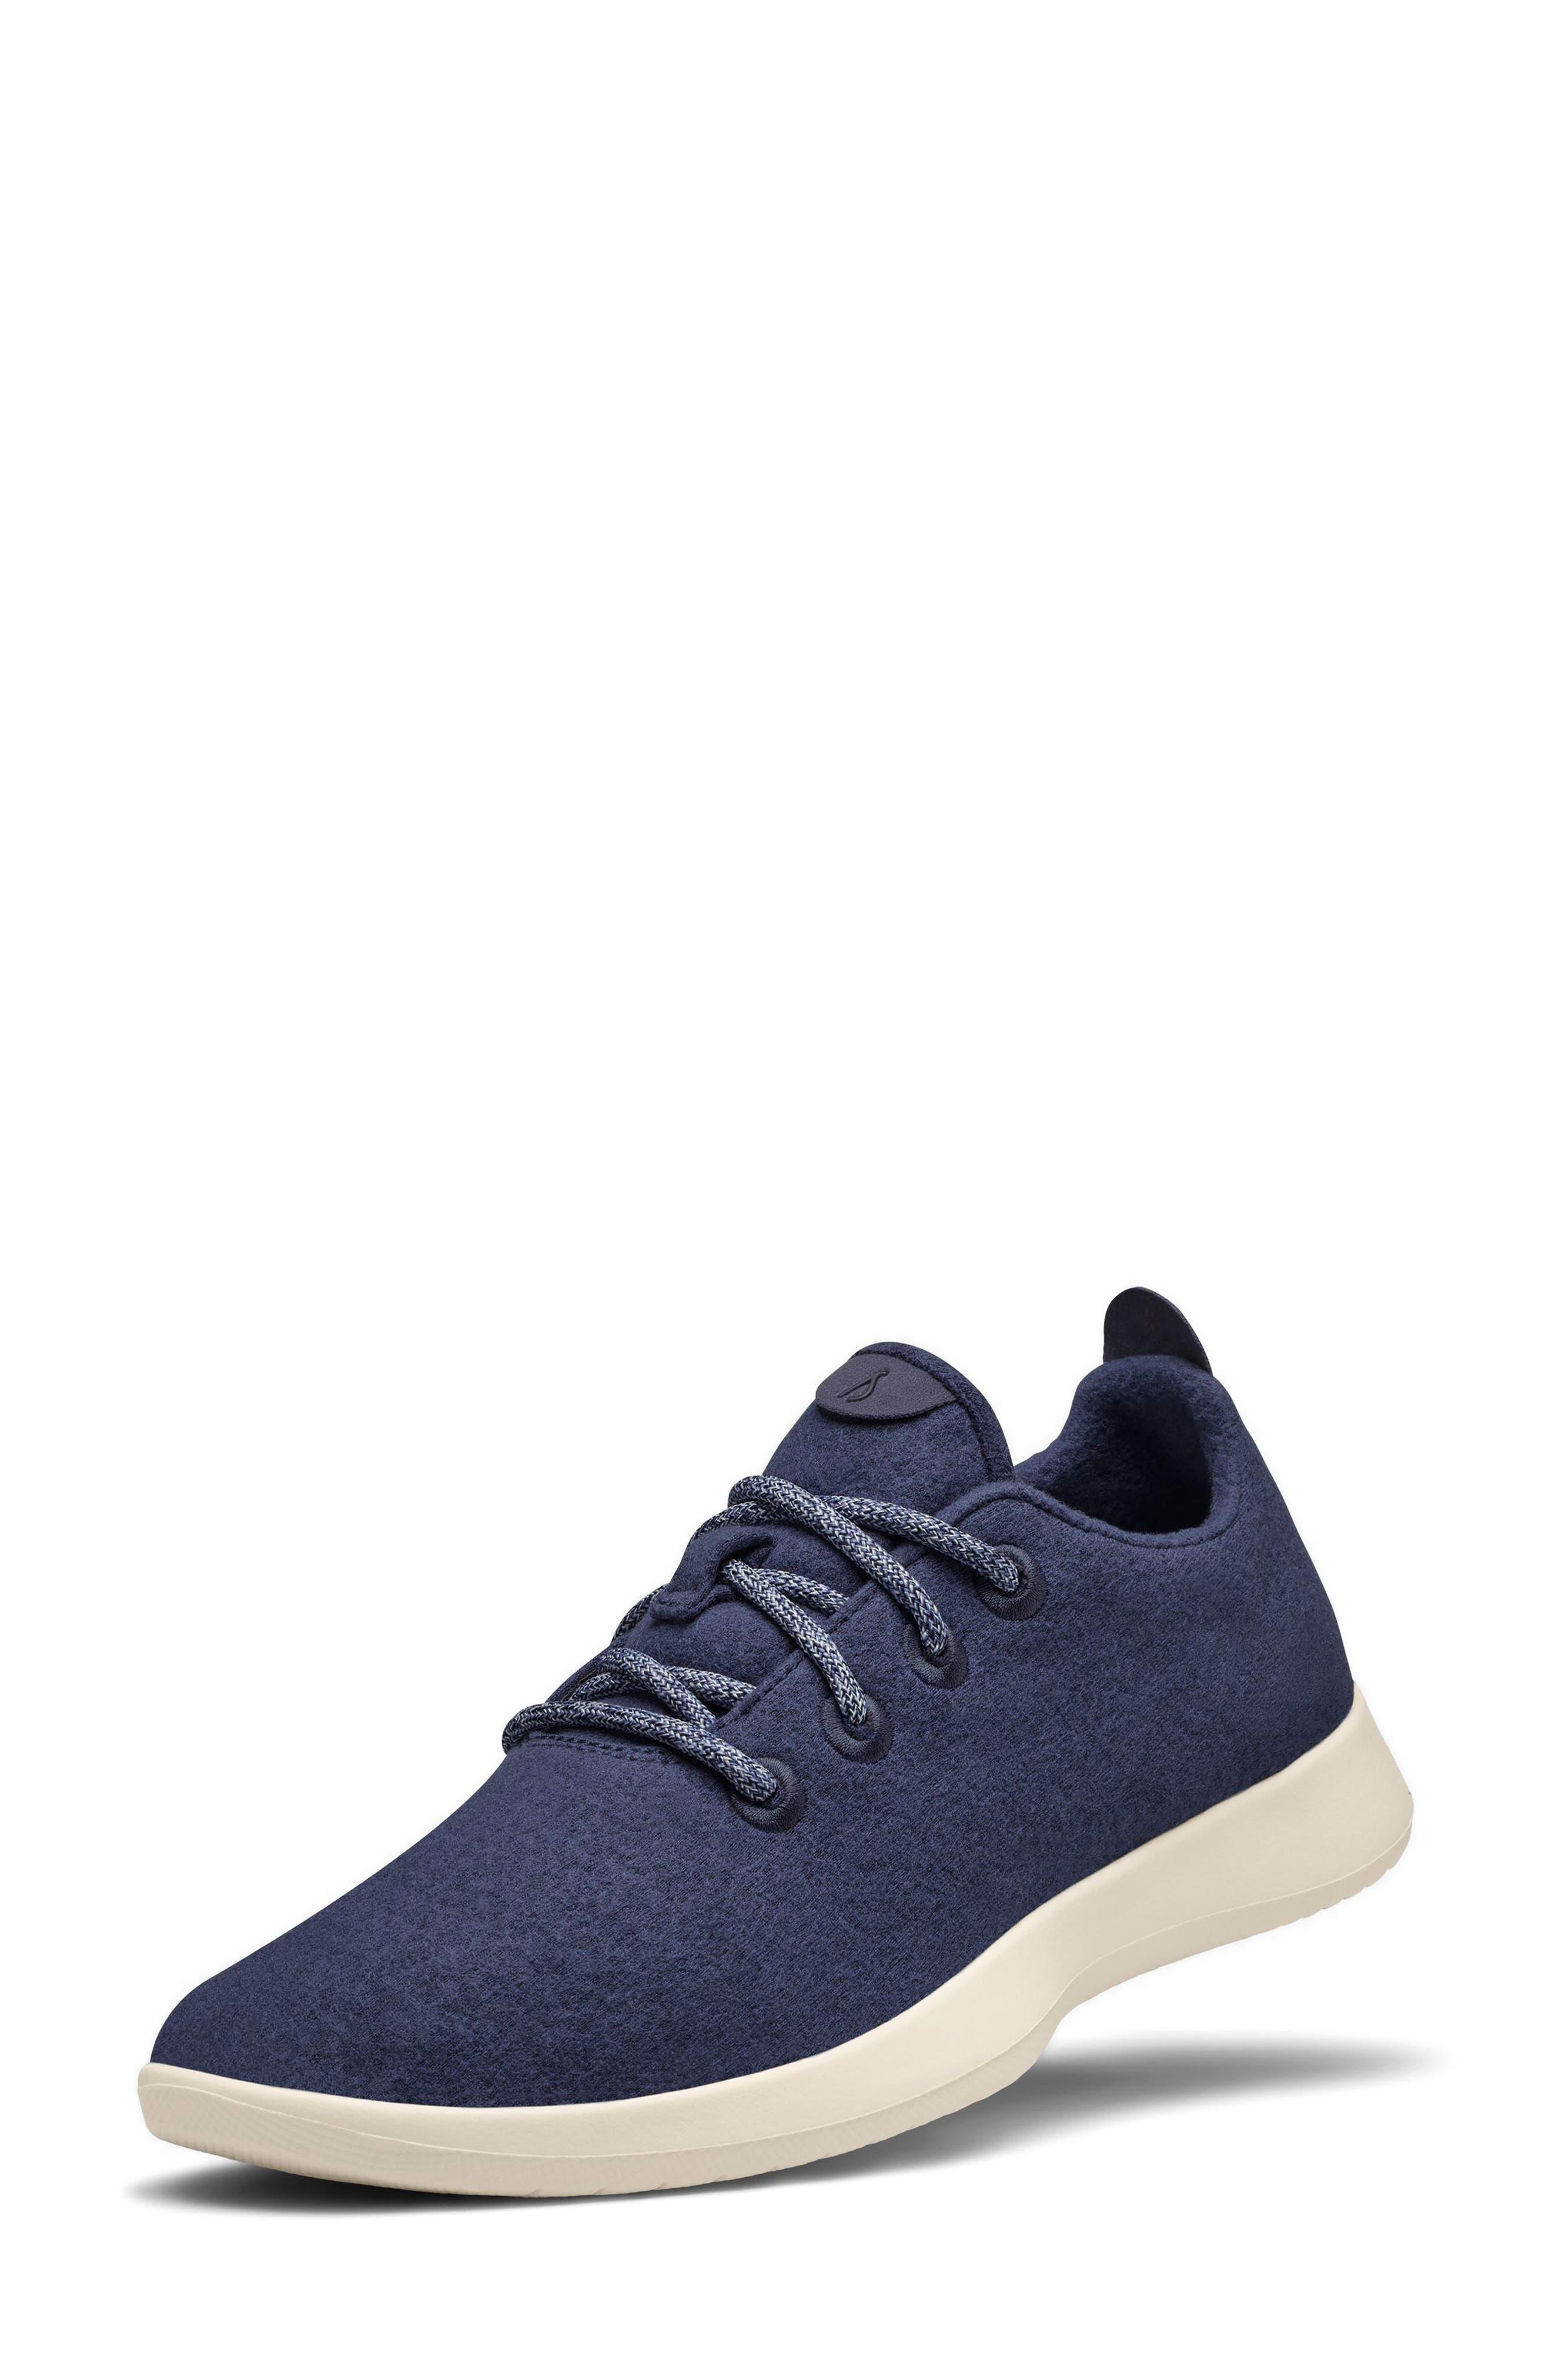 Allbirds | Wool Runner Sneaker